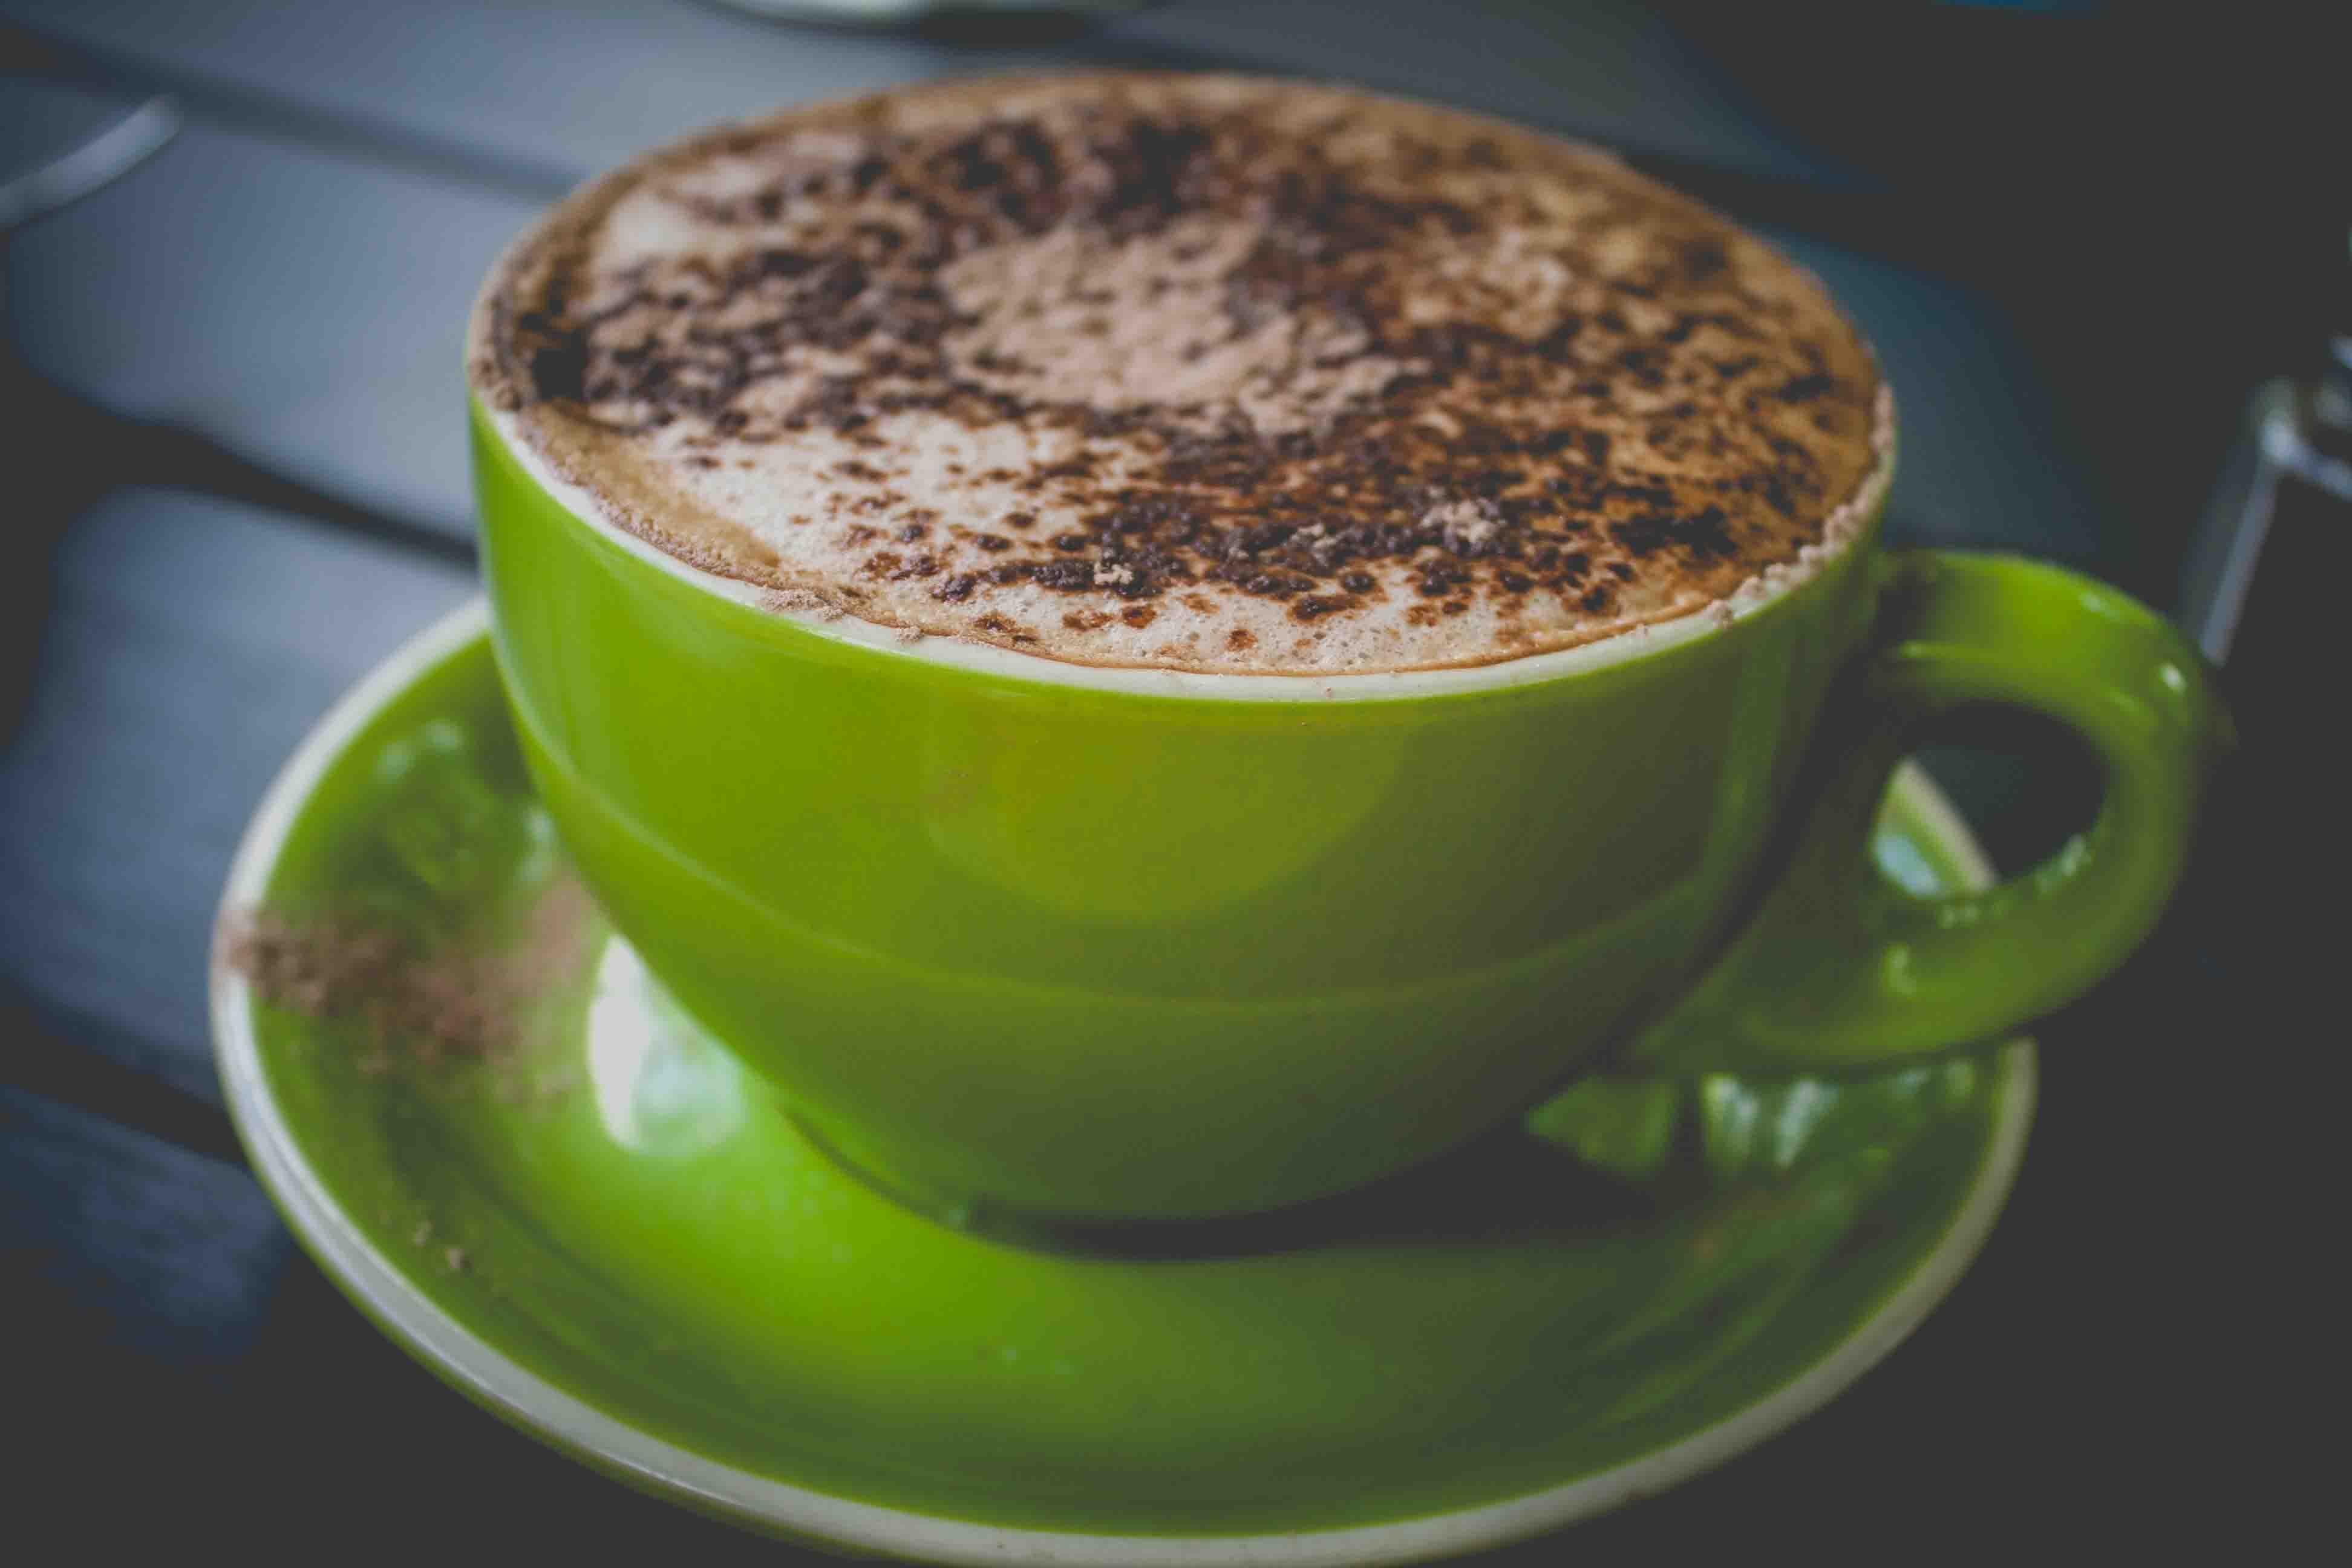 groene koffie bonen